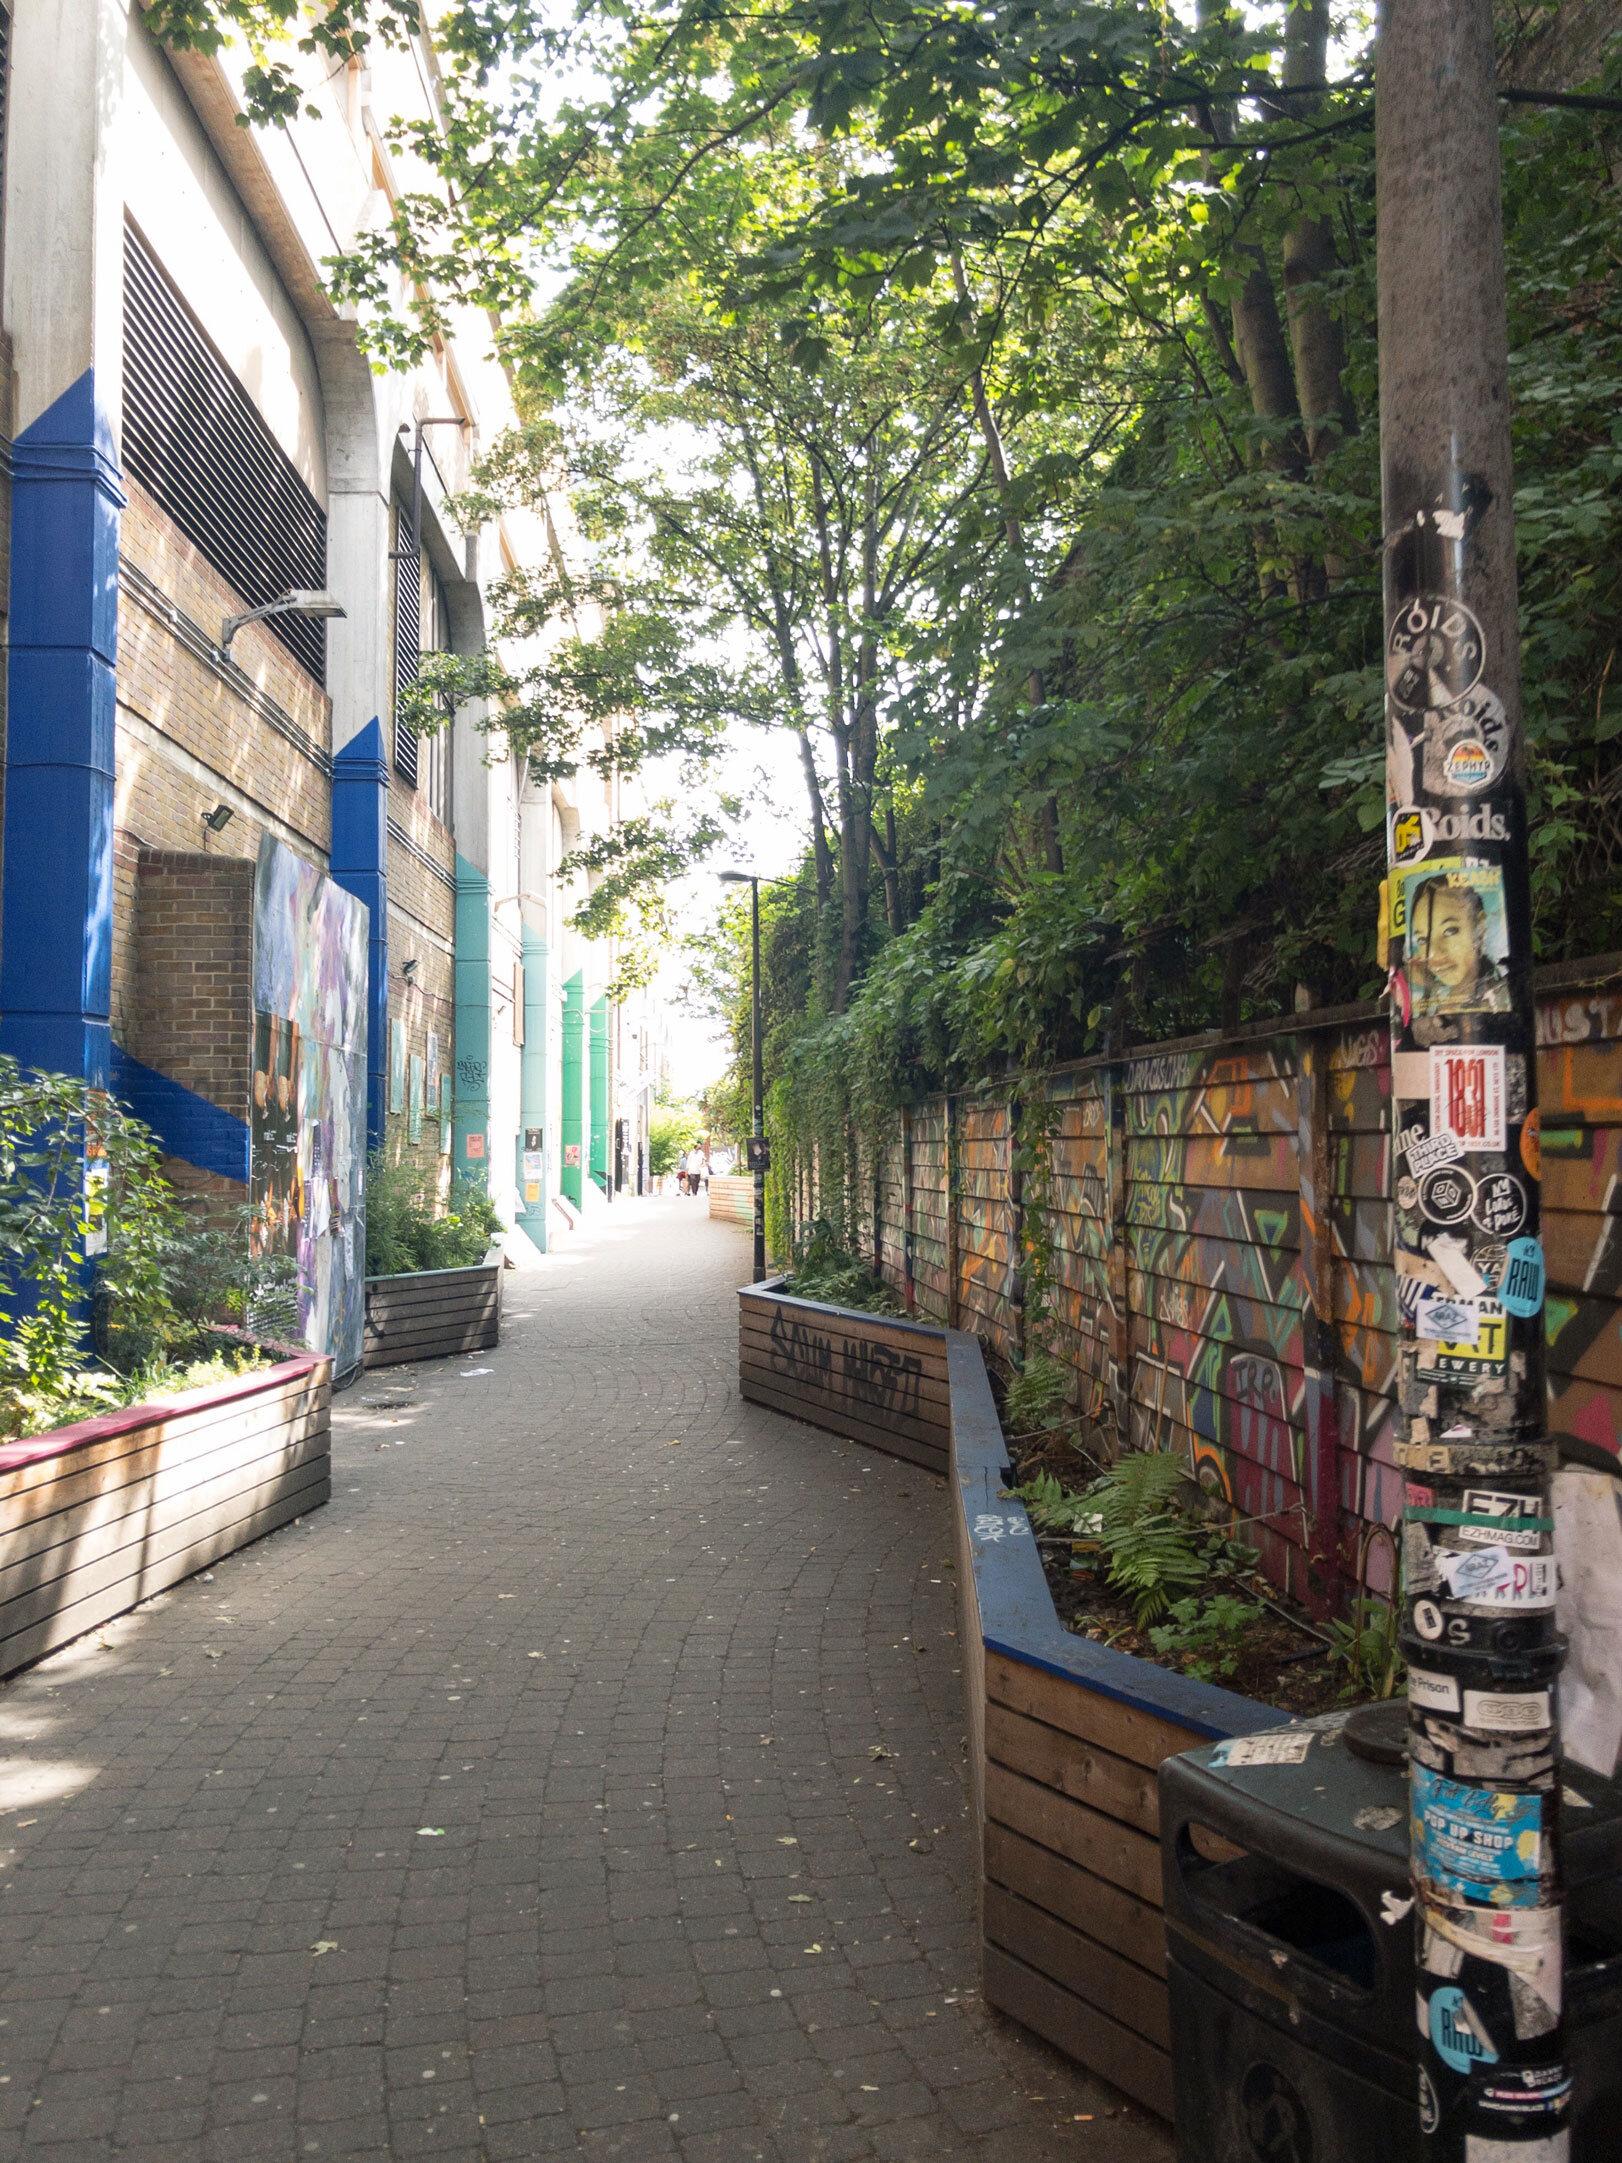 Visit-Peckham-Levels-London.jpg